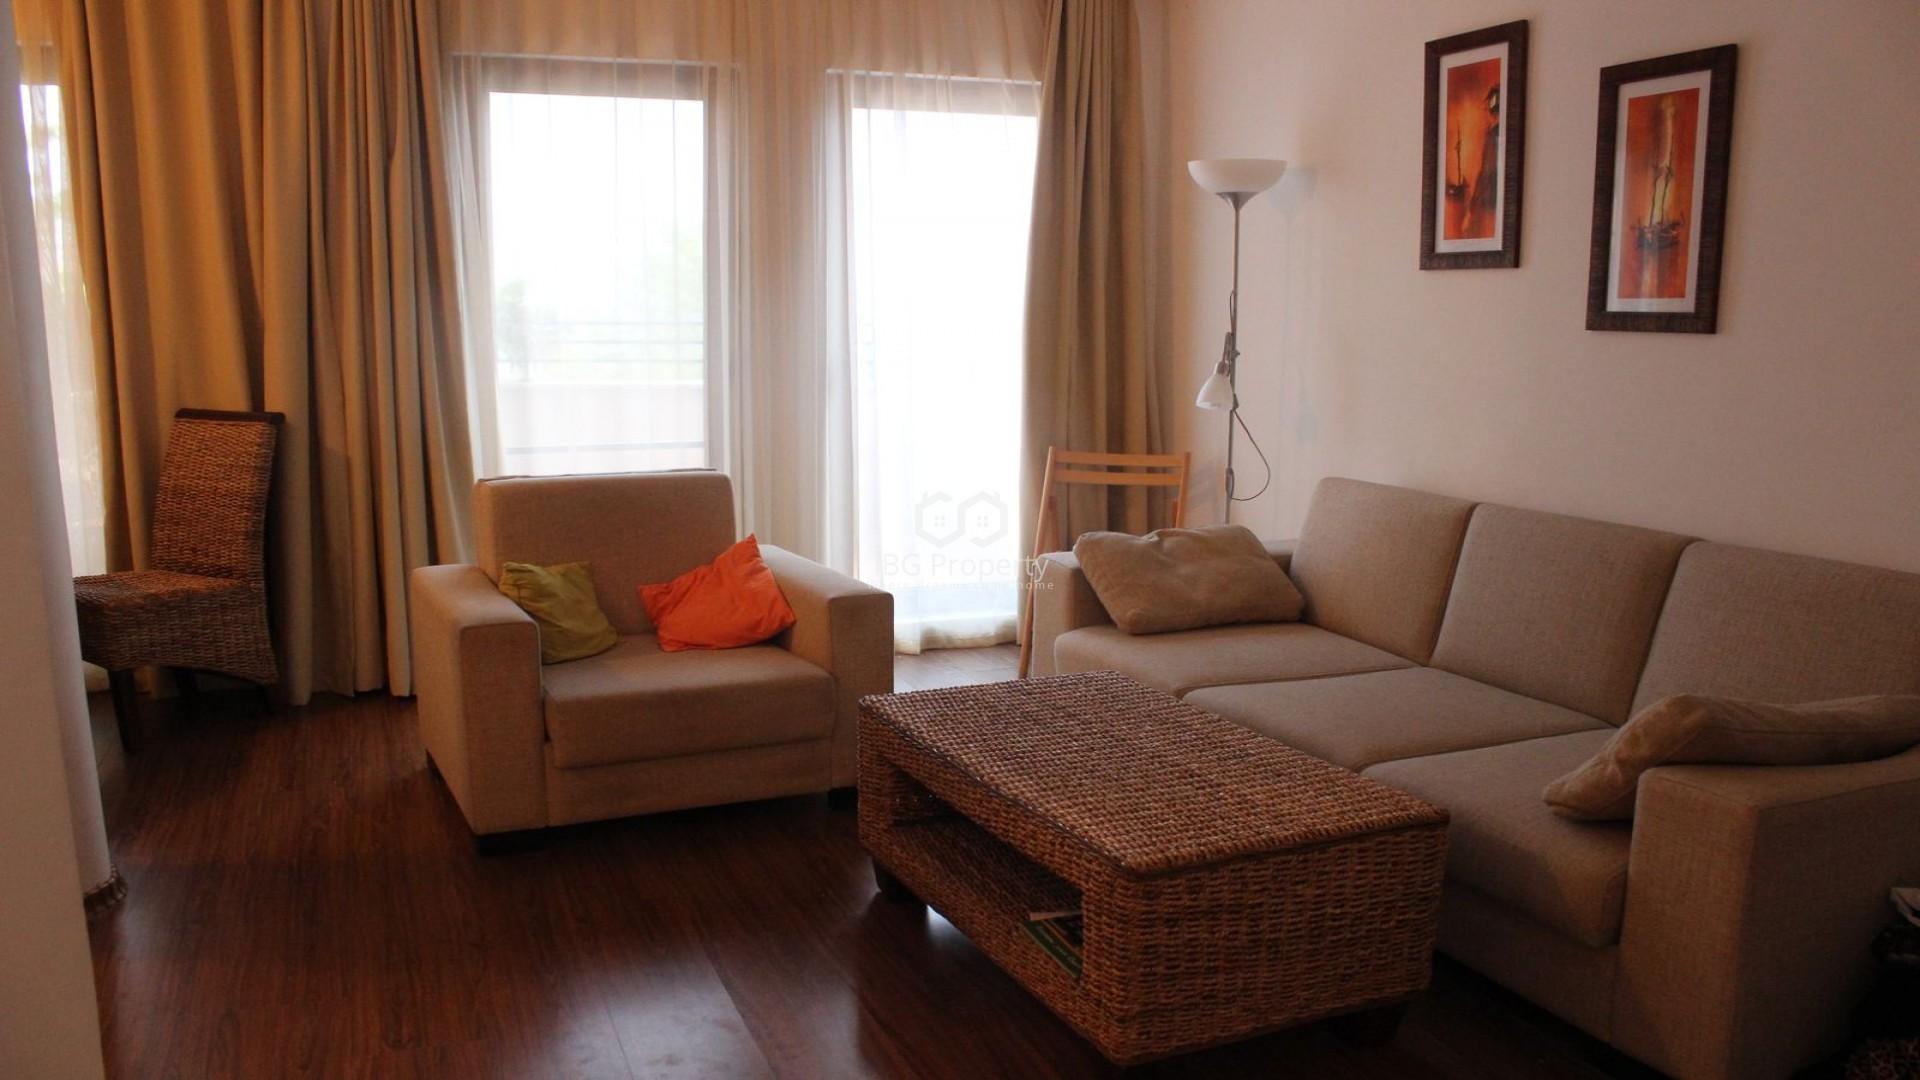 Трехкомнатная квартира Ахелой   91 m2